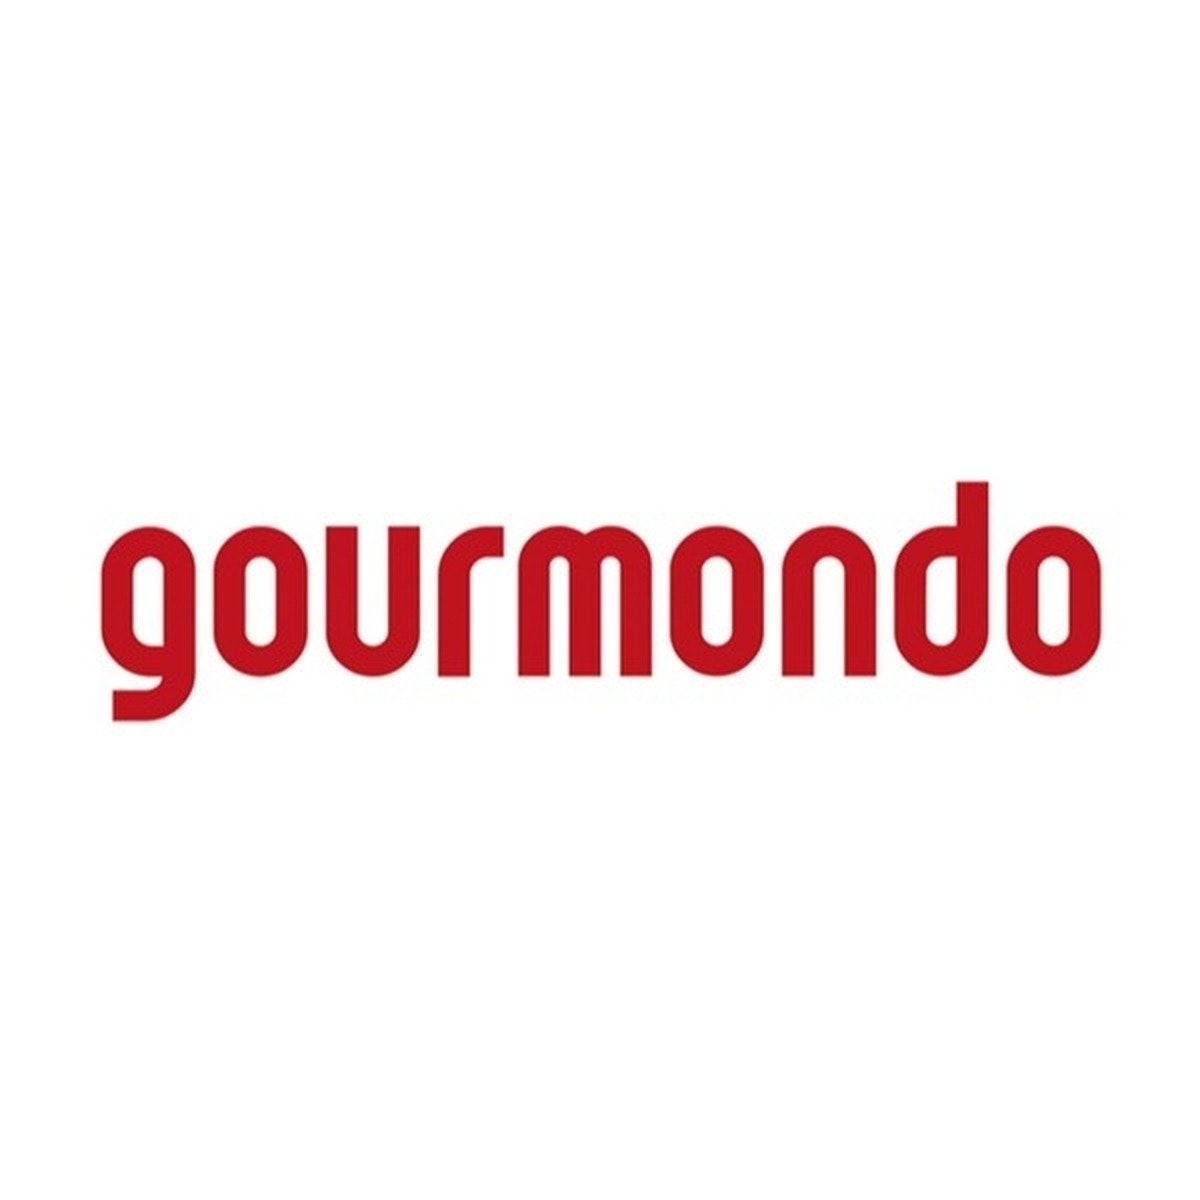 Gourmondo Food GmbH